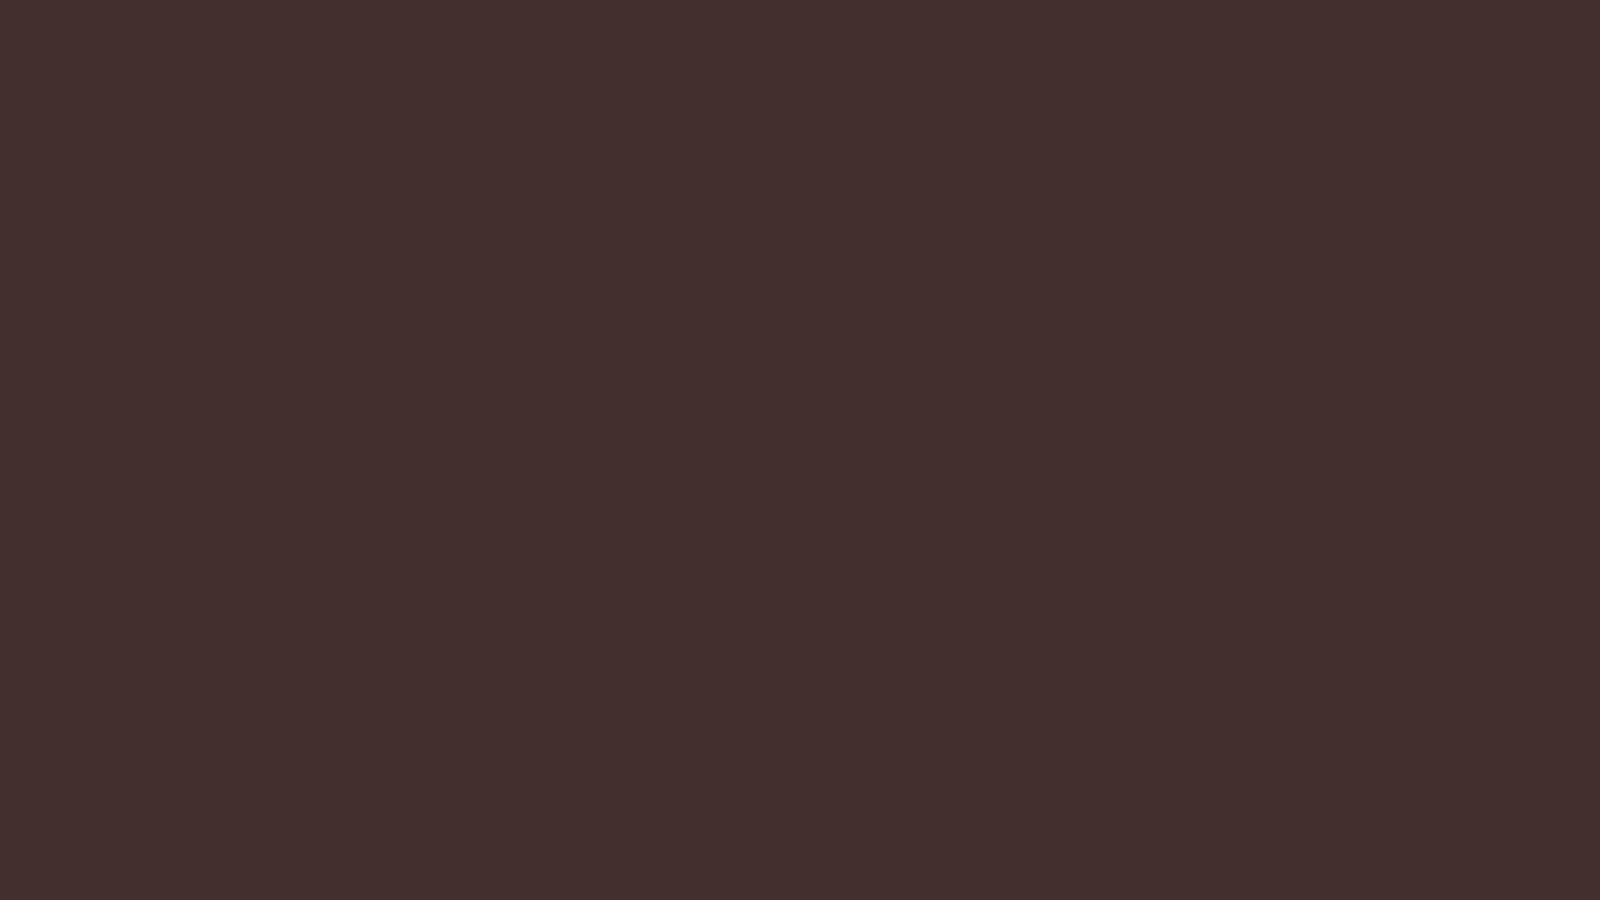 1600x900 Old Burgundy Solid Color Background